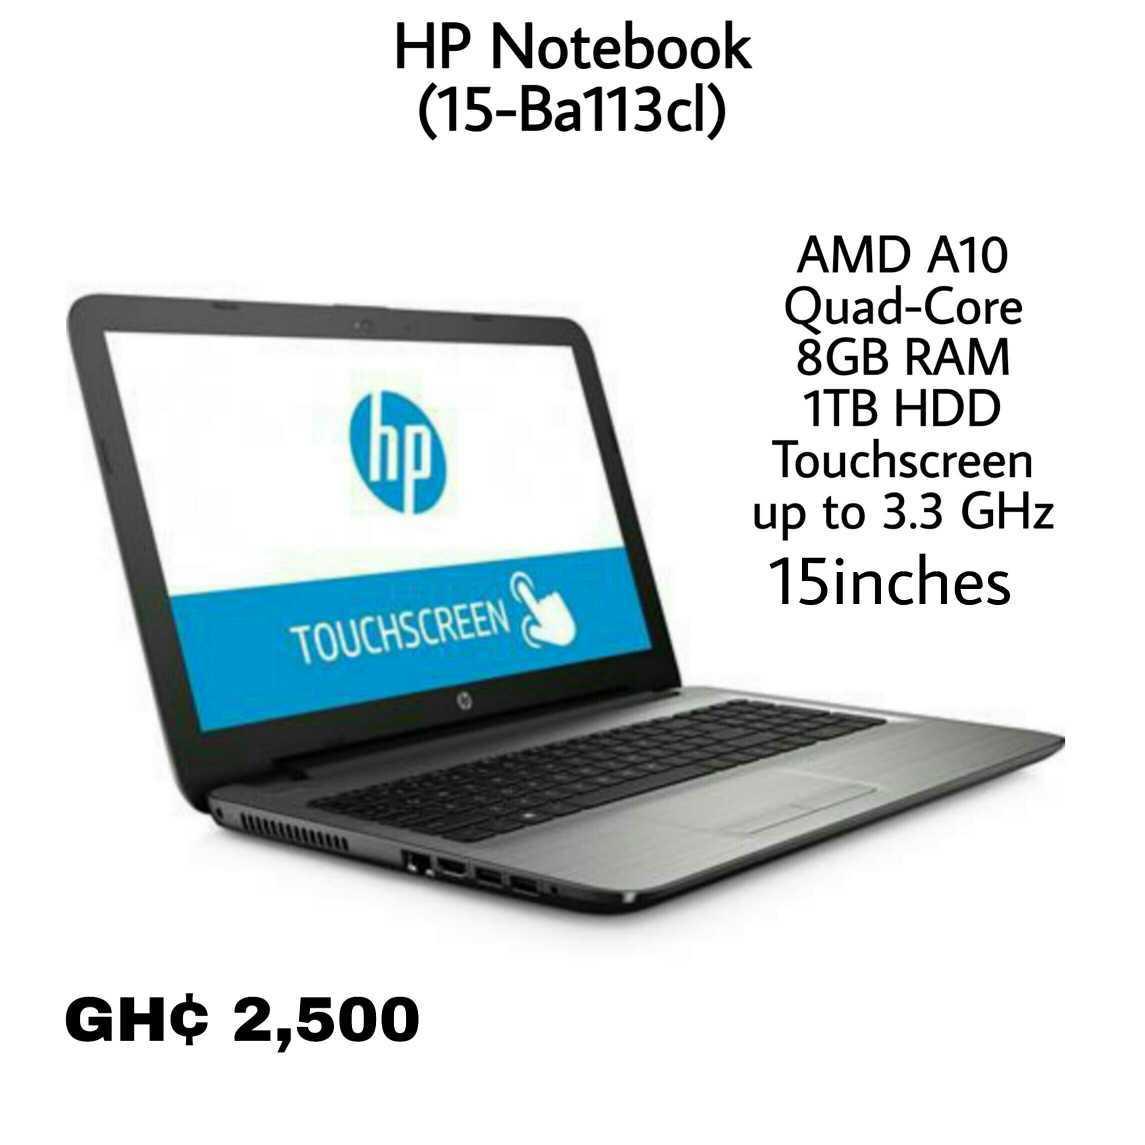 hp notebook price in ghana